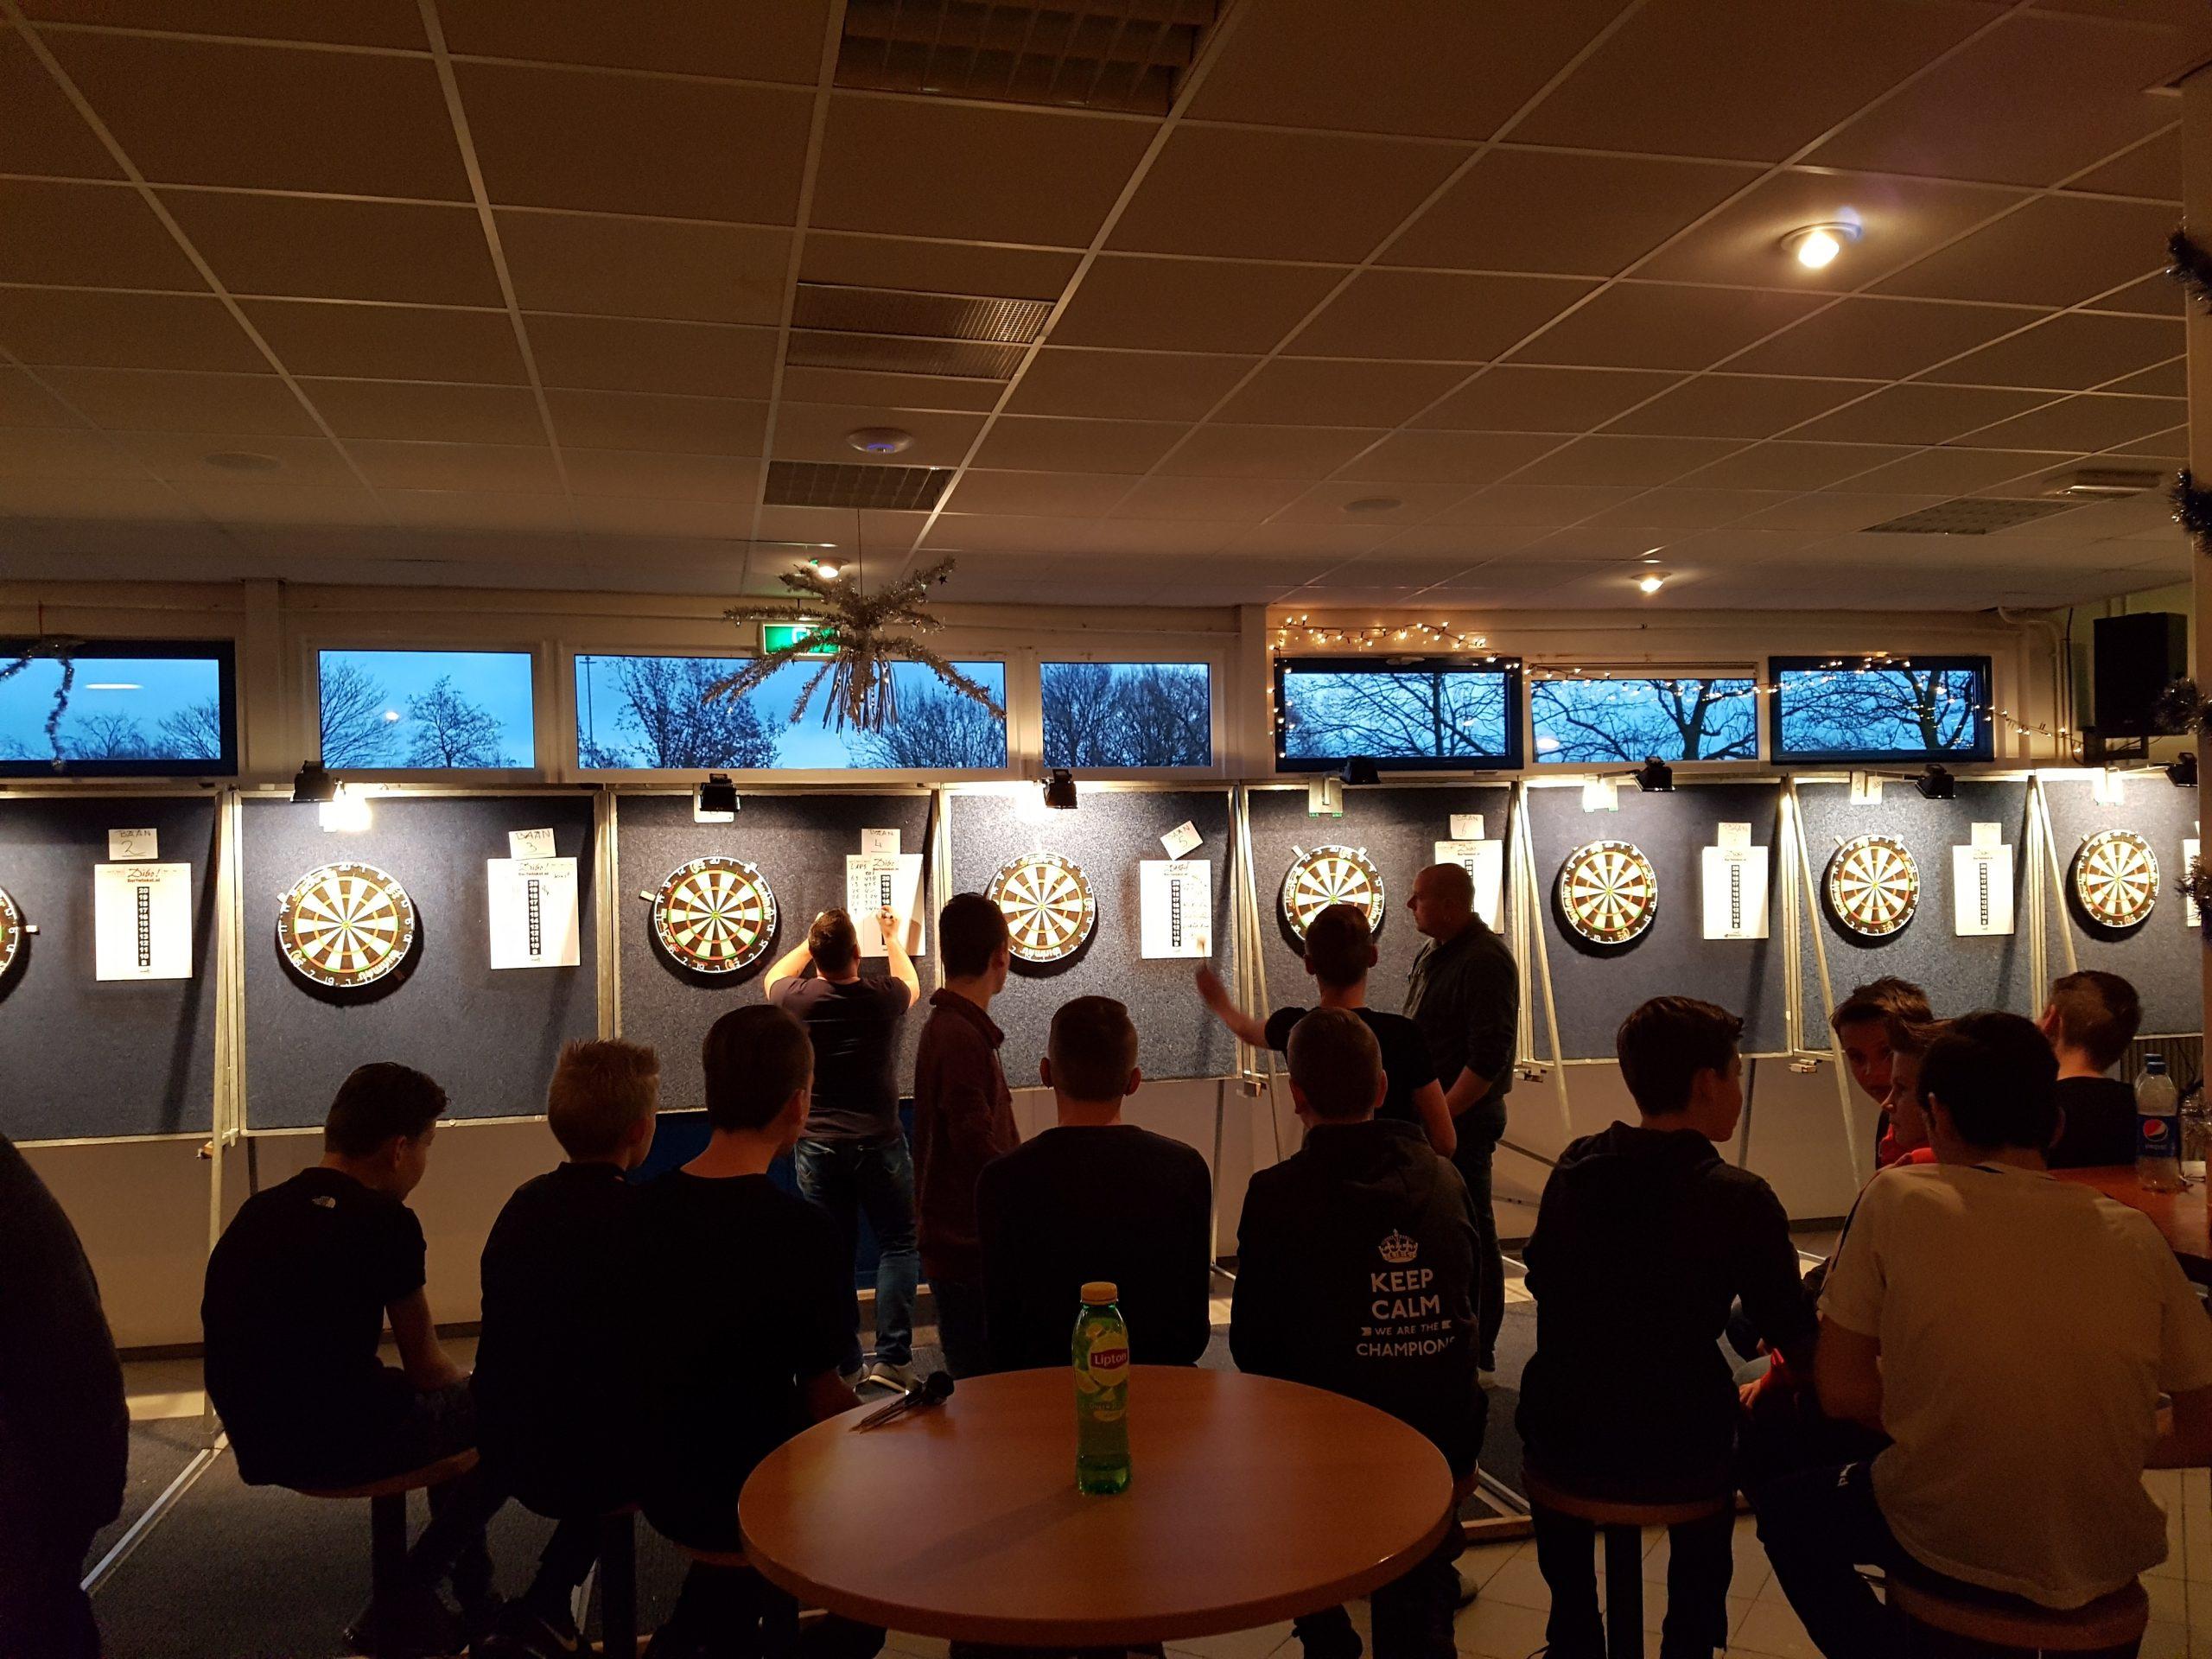 Tweede editie Gerrit Nagelhout darttoernooi groot succes - Elburger SC